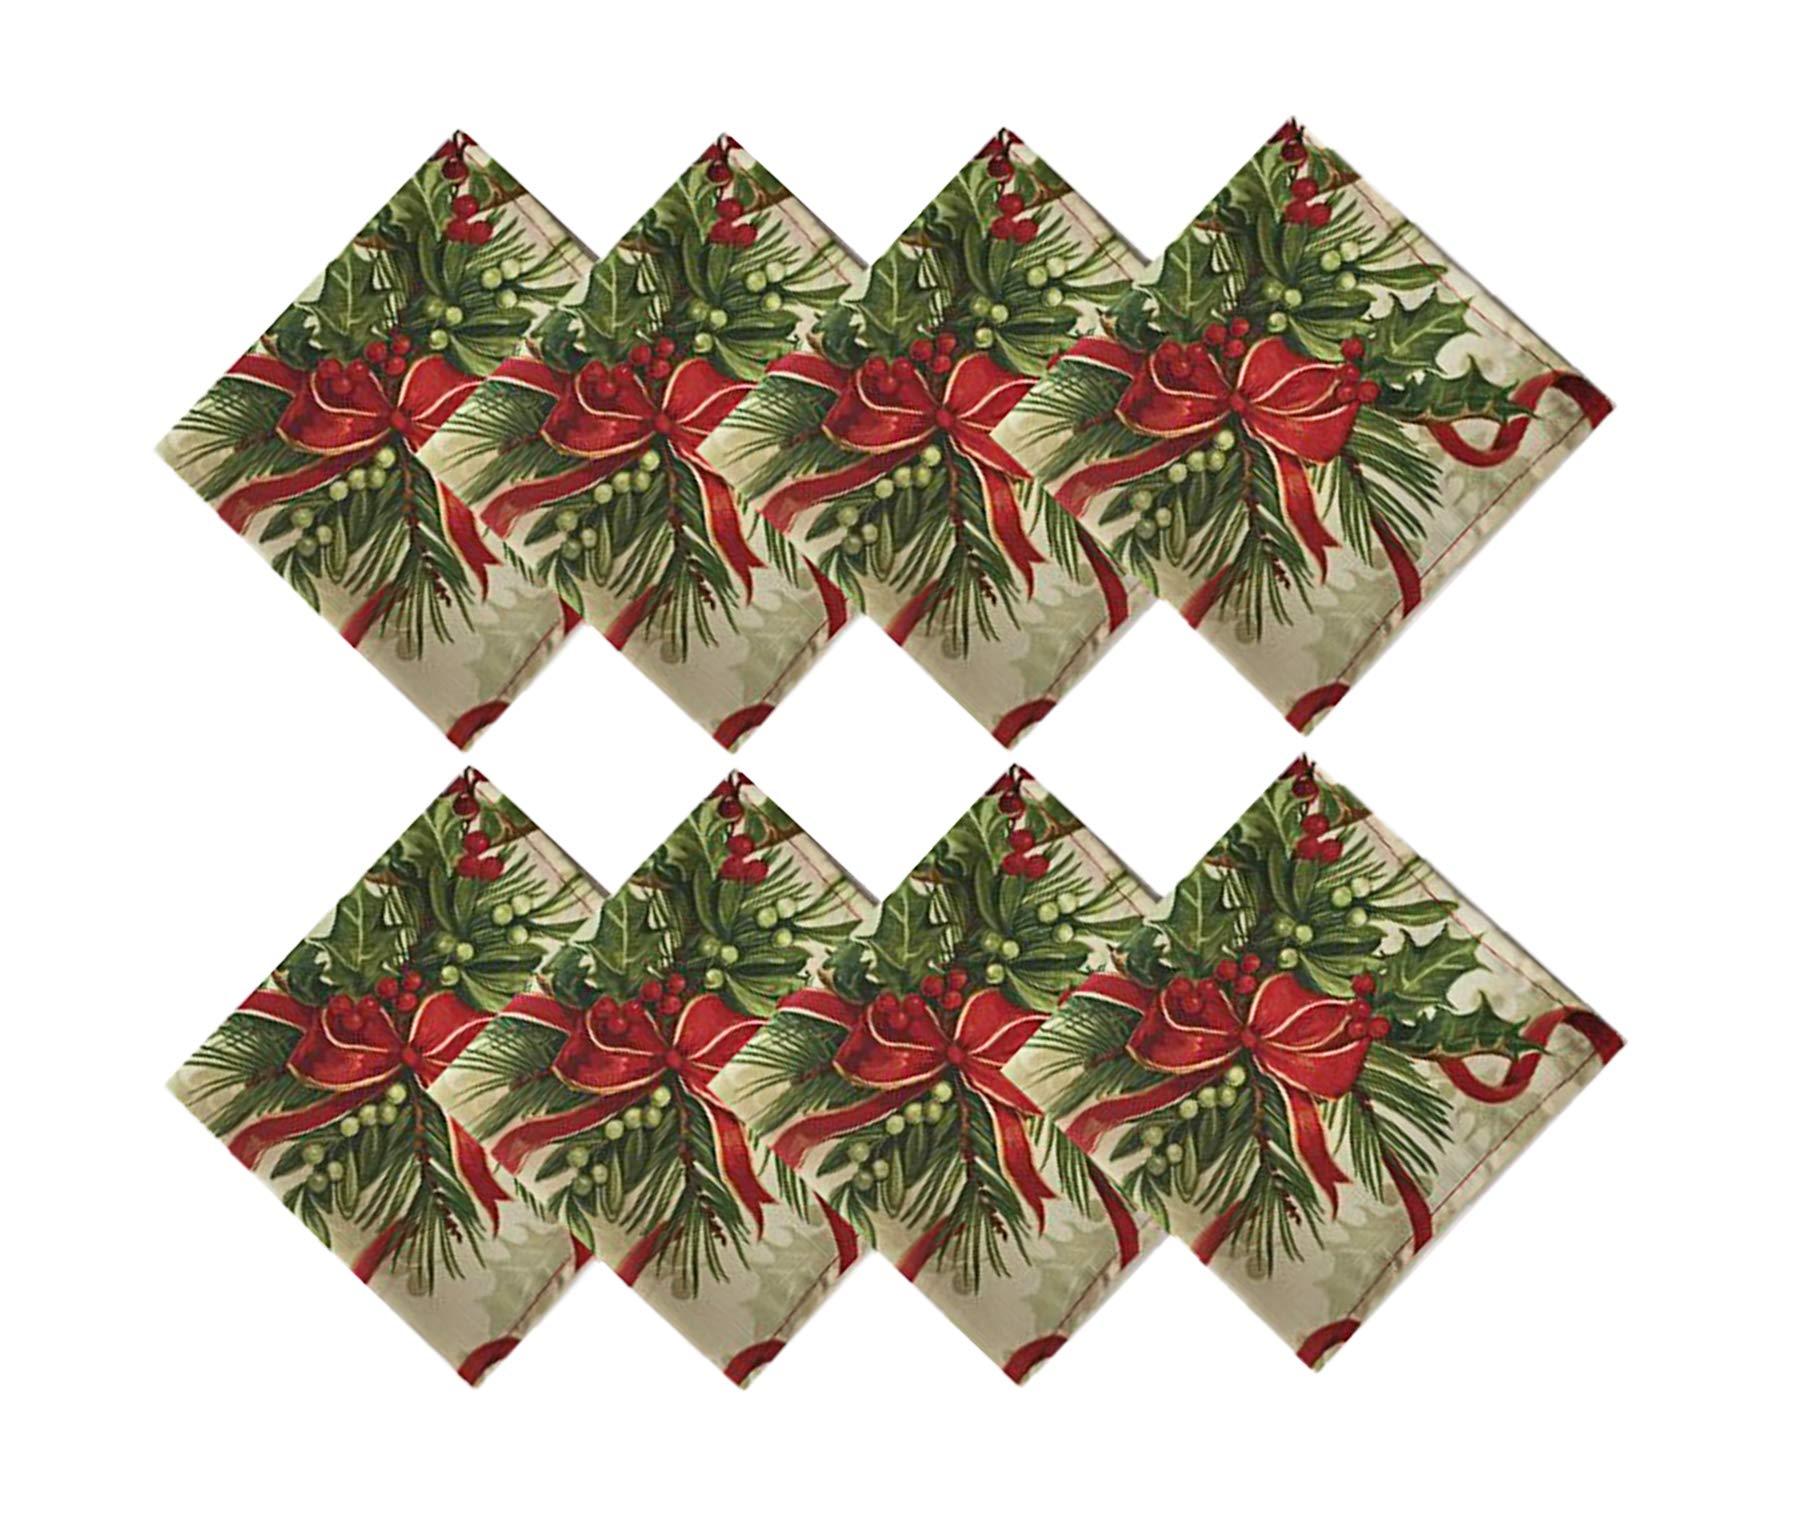 Newbridge Holly Ribbon Traditions Fabric Christmas Holiday Napkin Set, Xmas Ribbons Double Border Napkins, Set of 8 Fabric Napkins